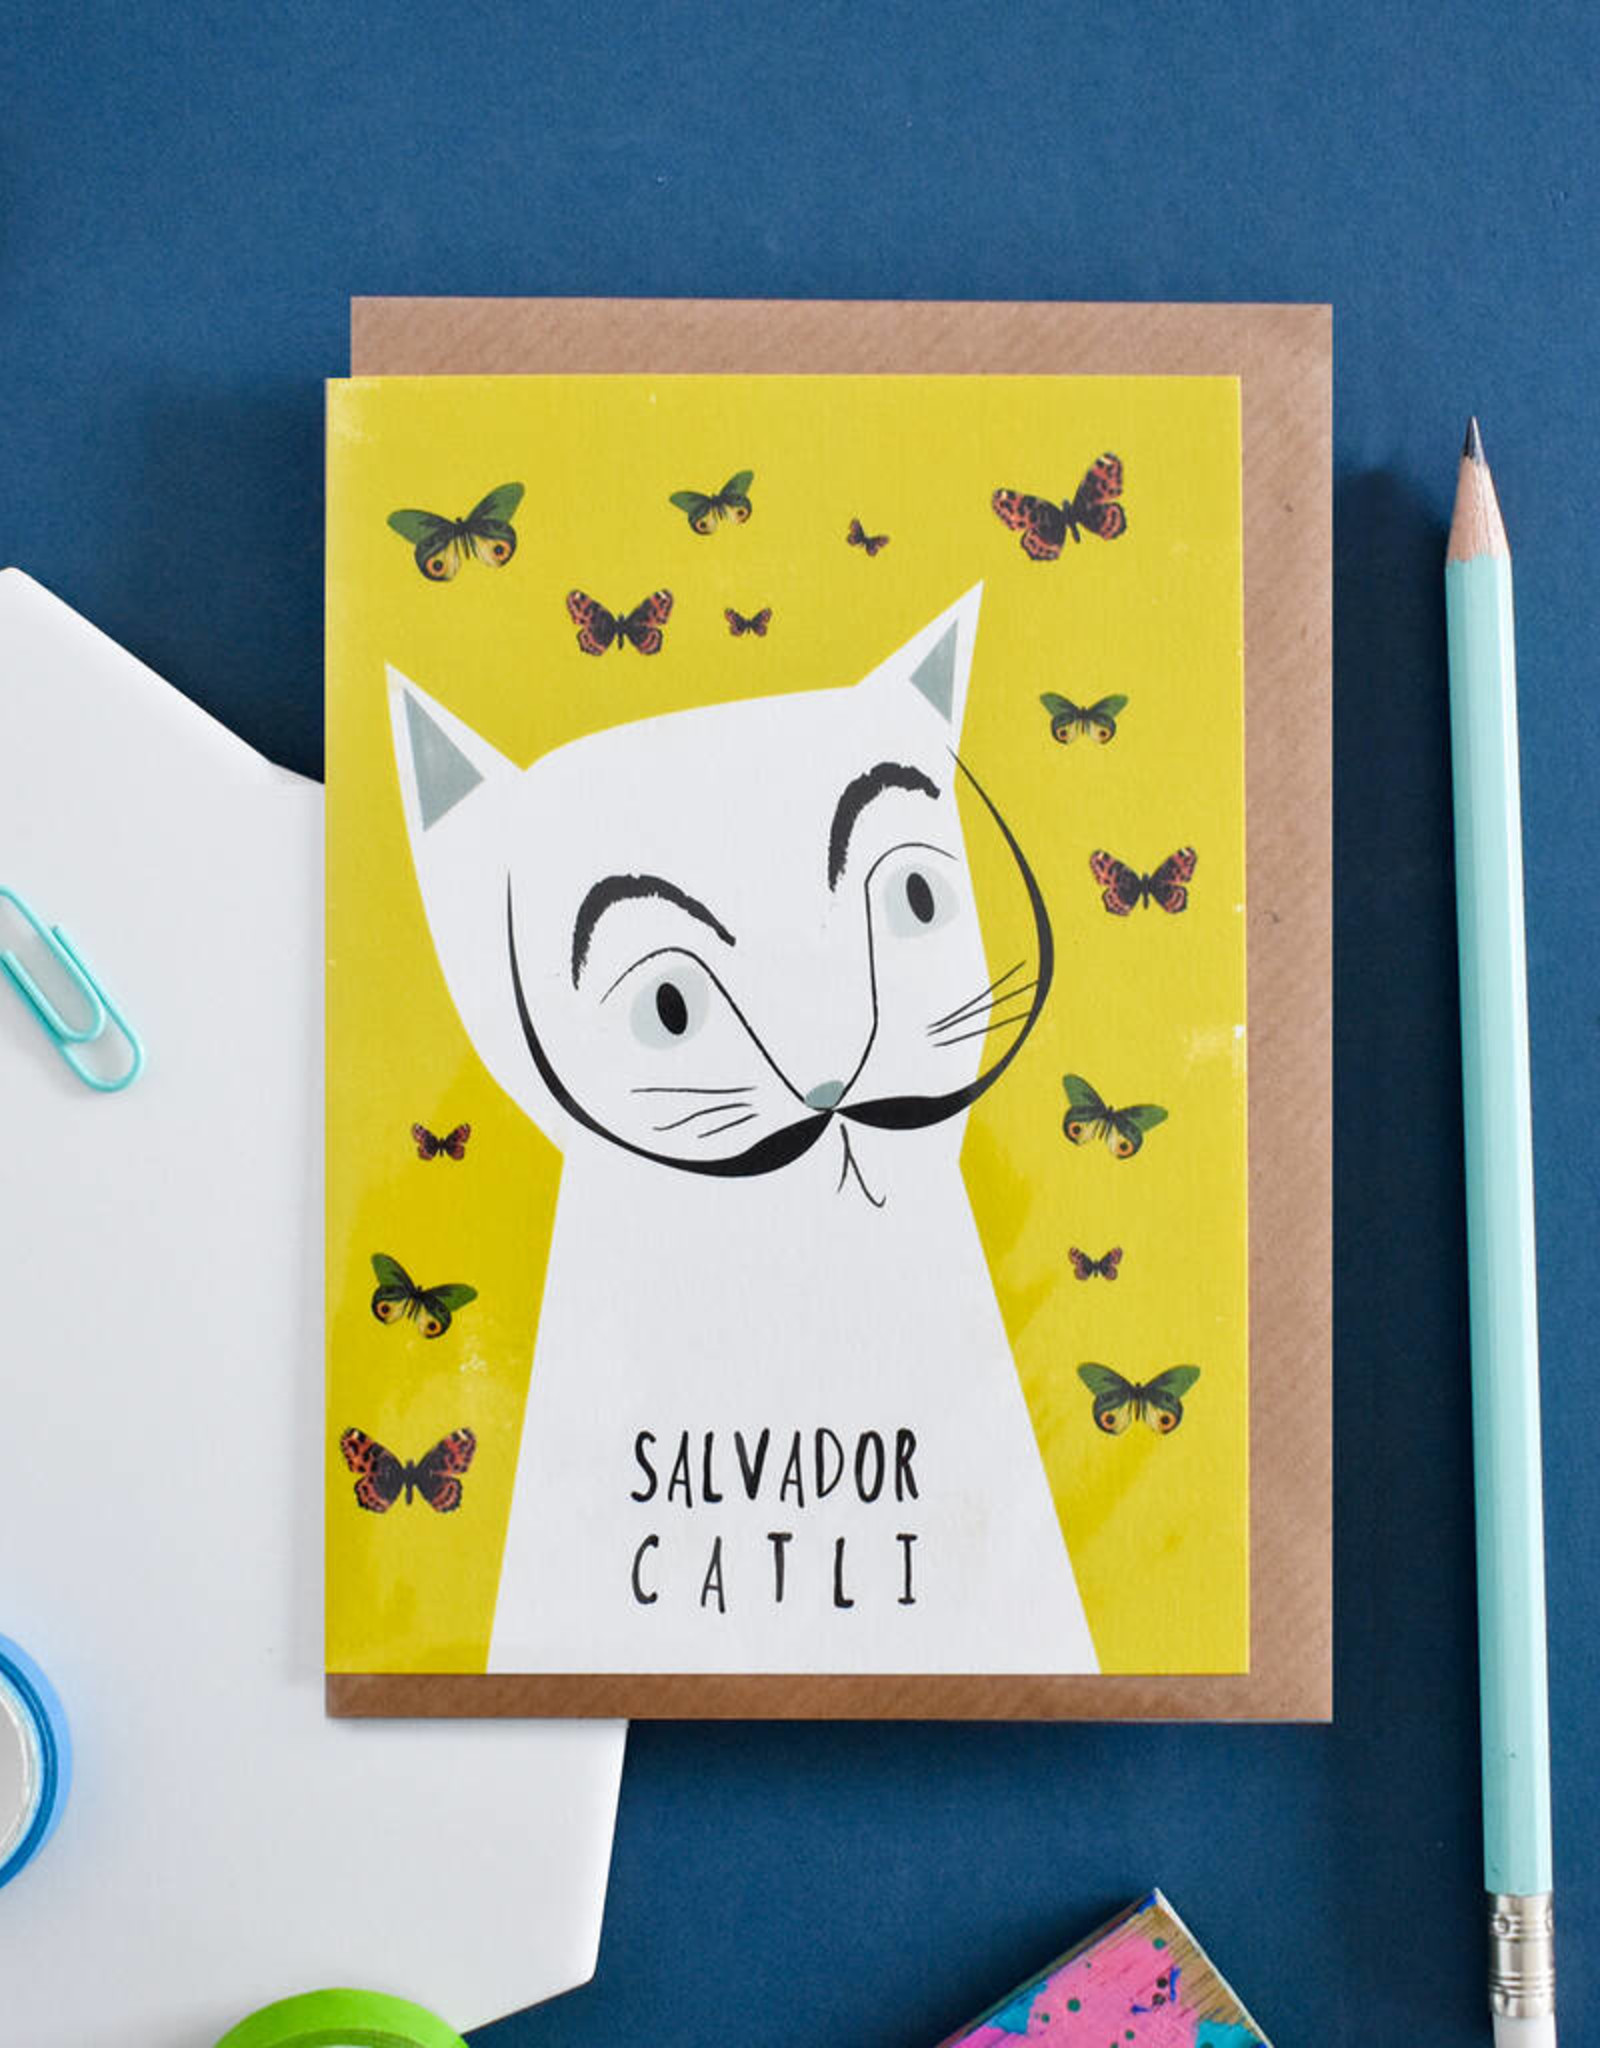 Niaski Niaski - Salvador Catli kaart